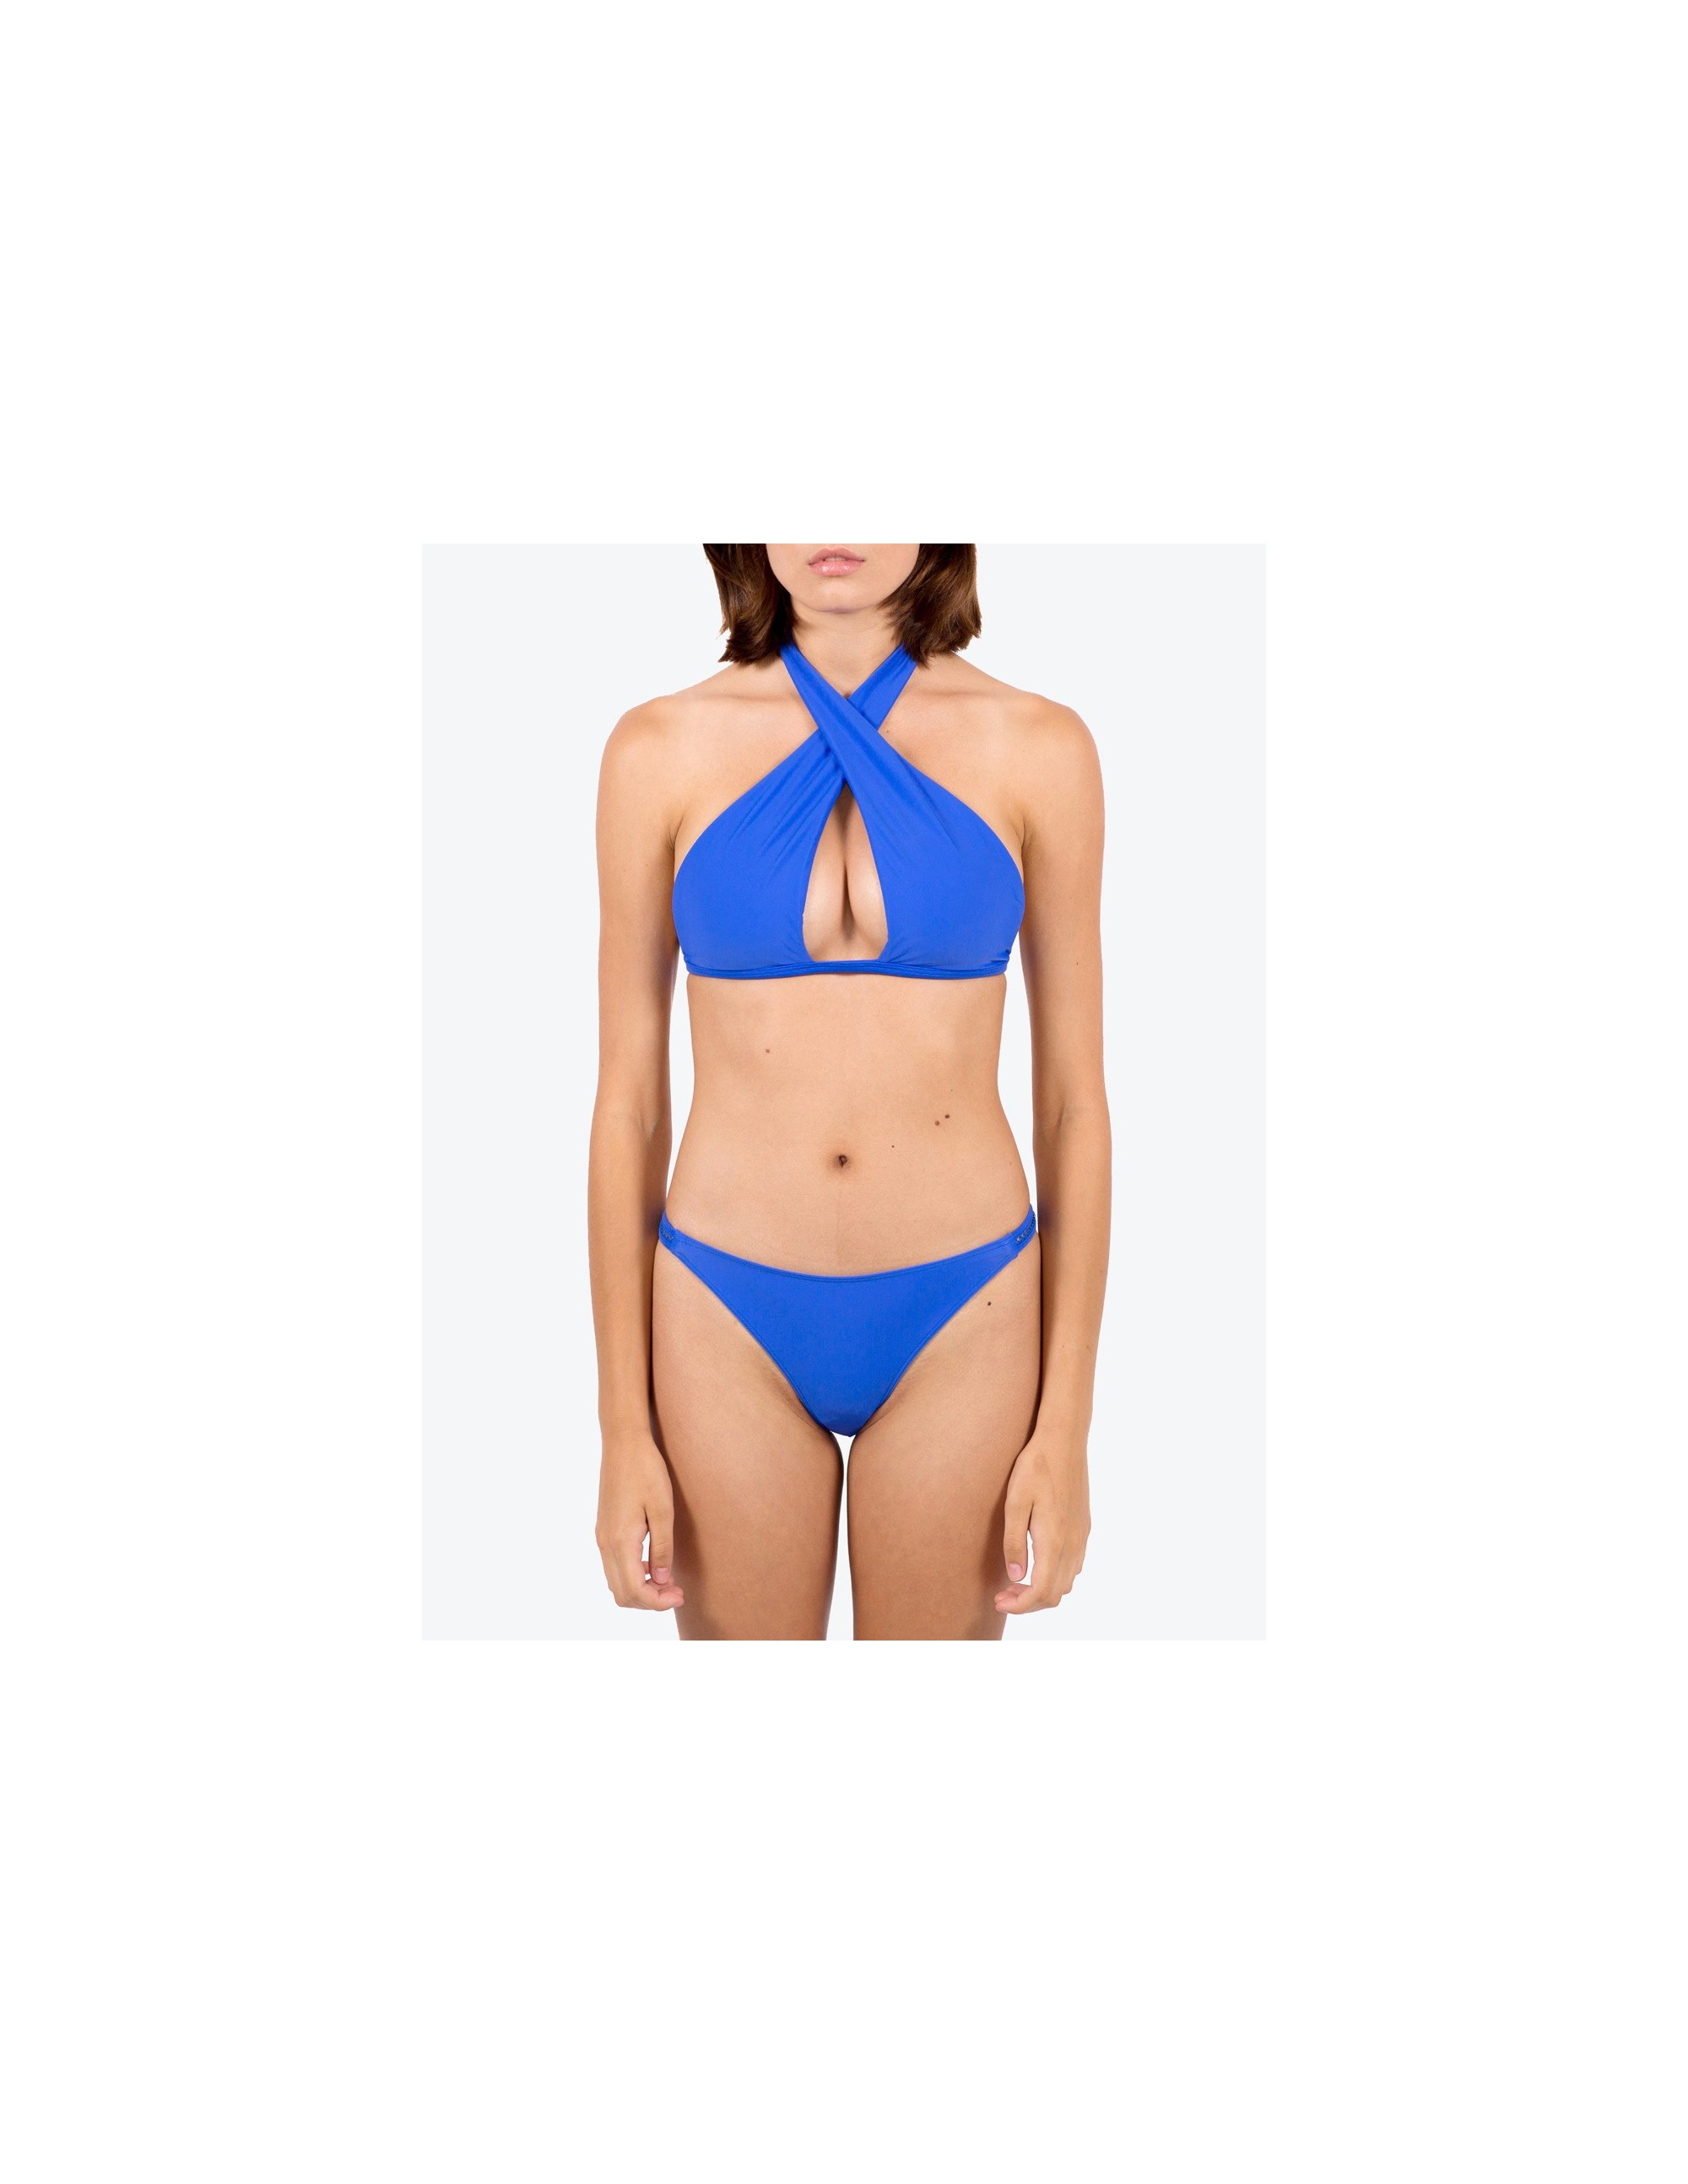 CONTA bikini top - ECHO BLUE